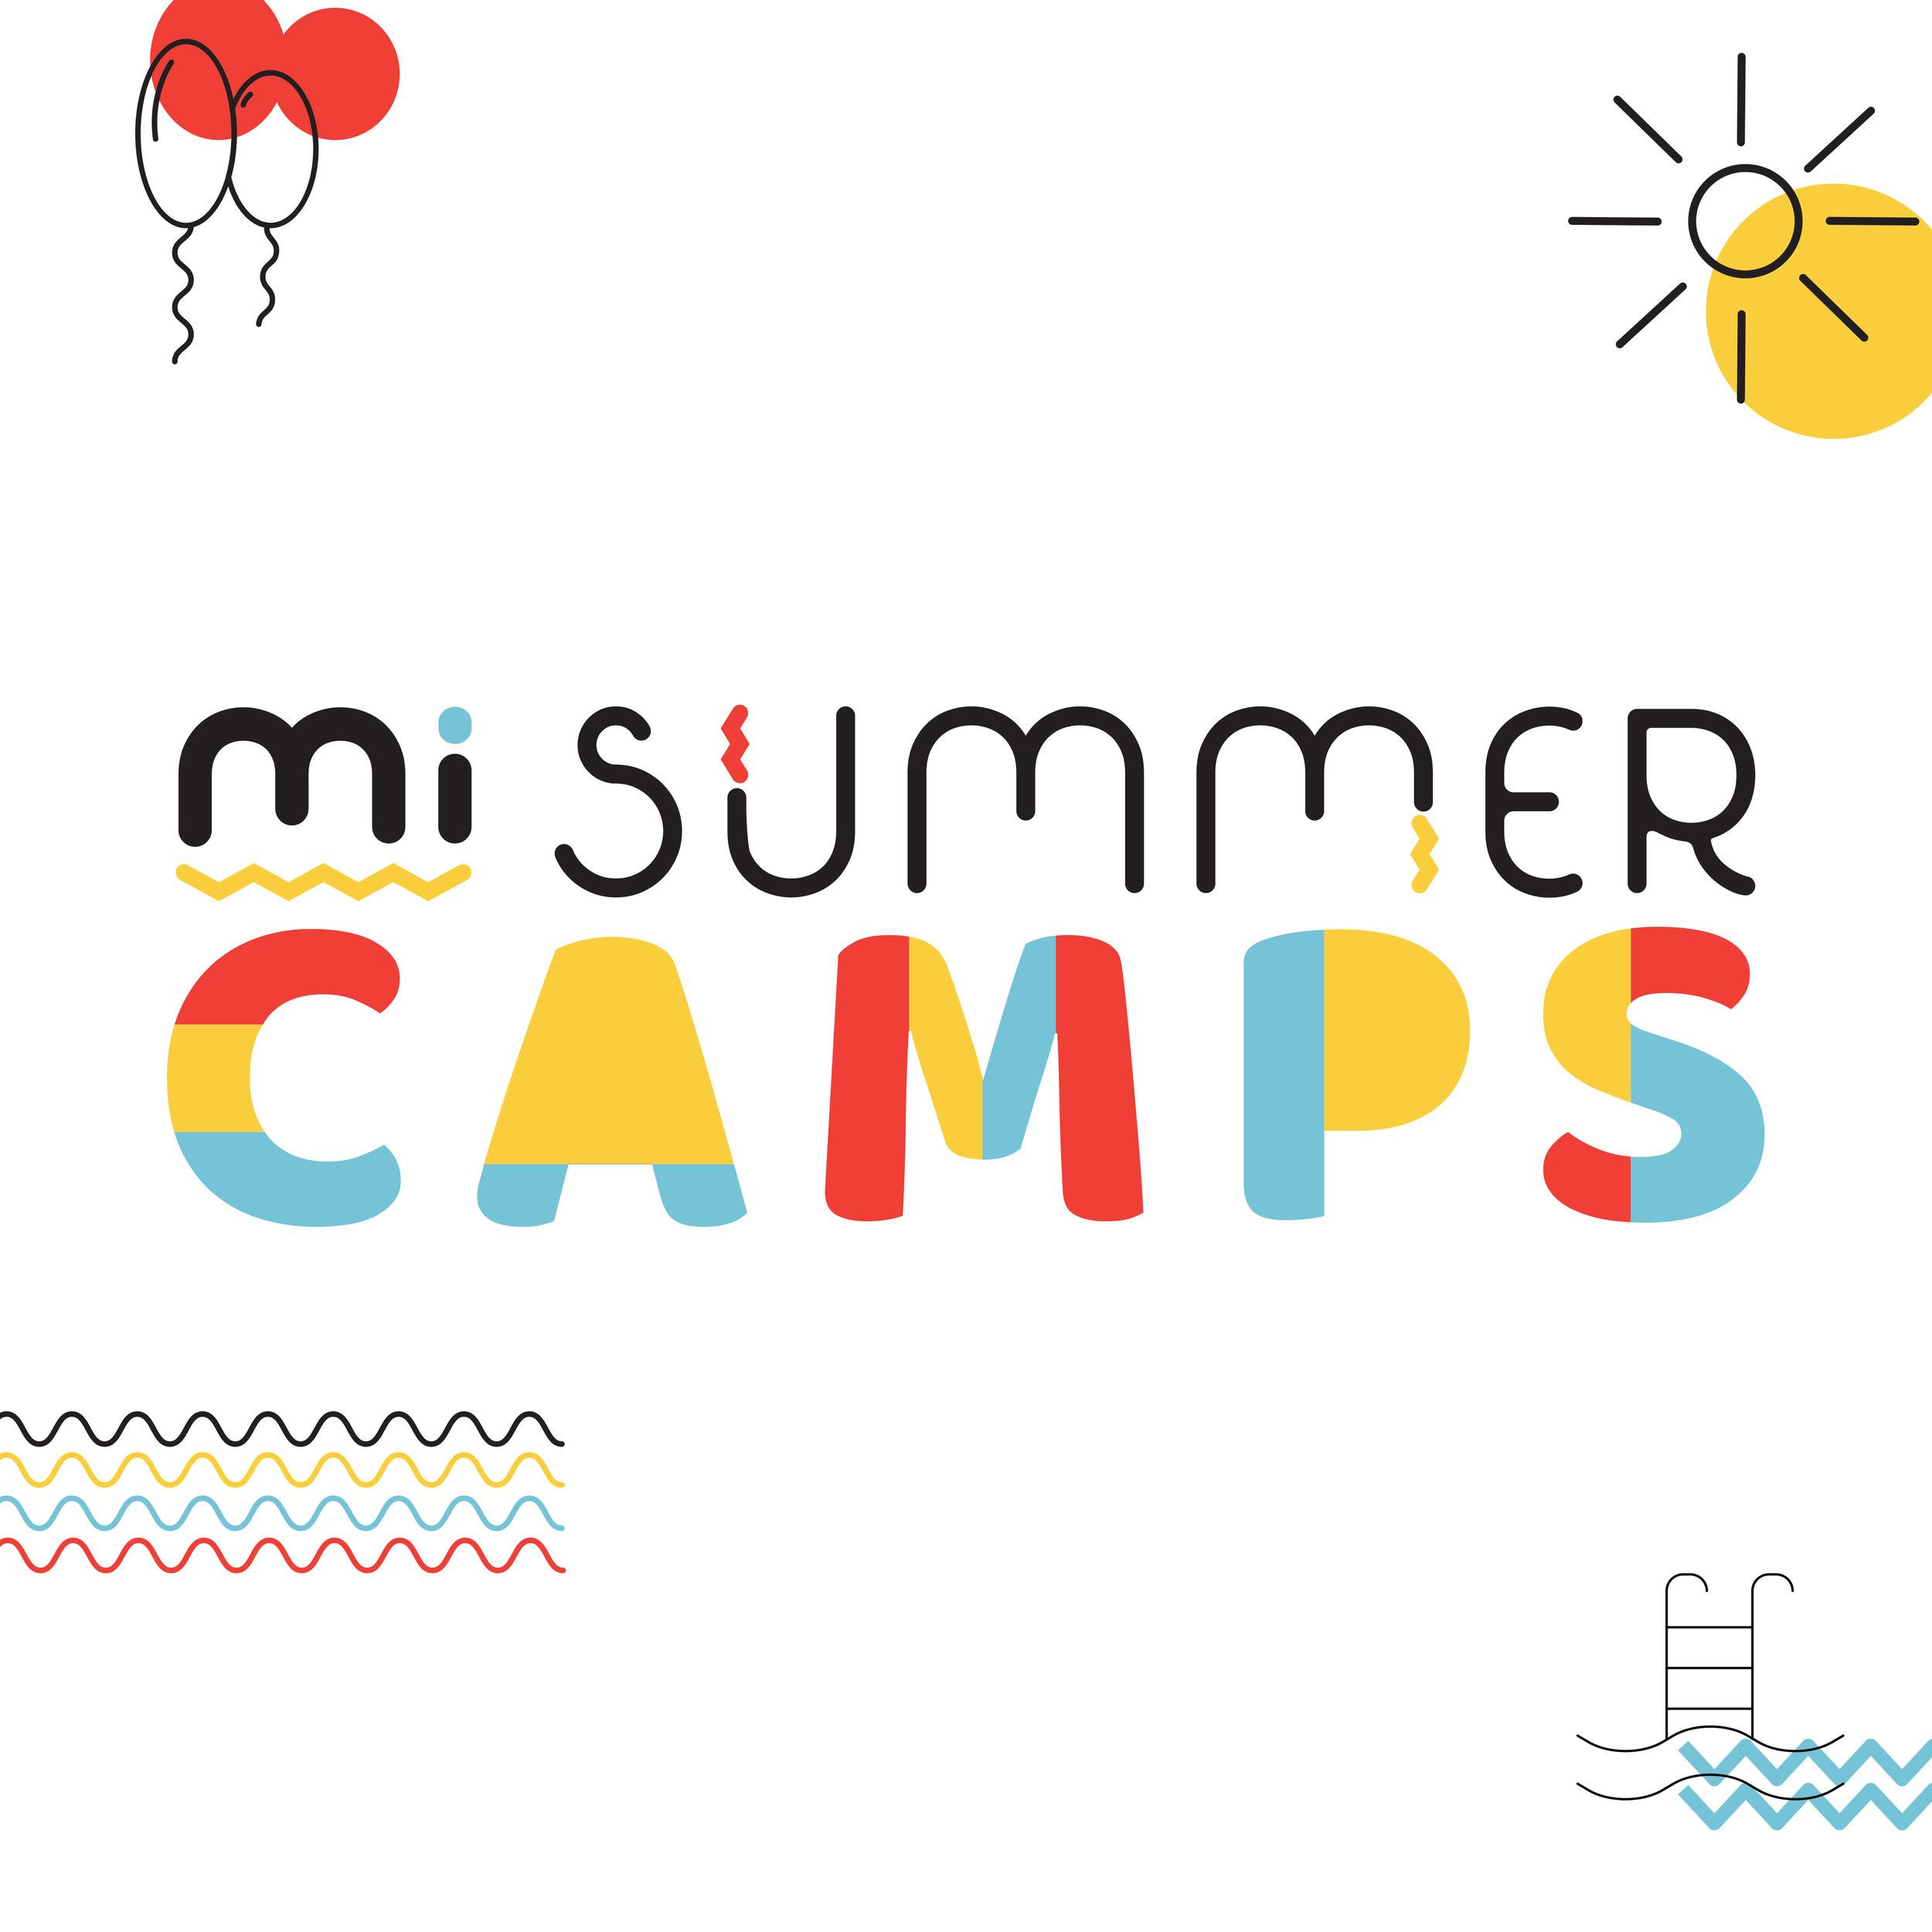 SummerCampsLogoCoverImage2.jpg